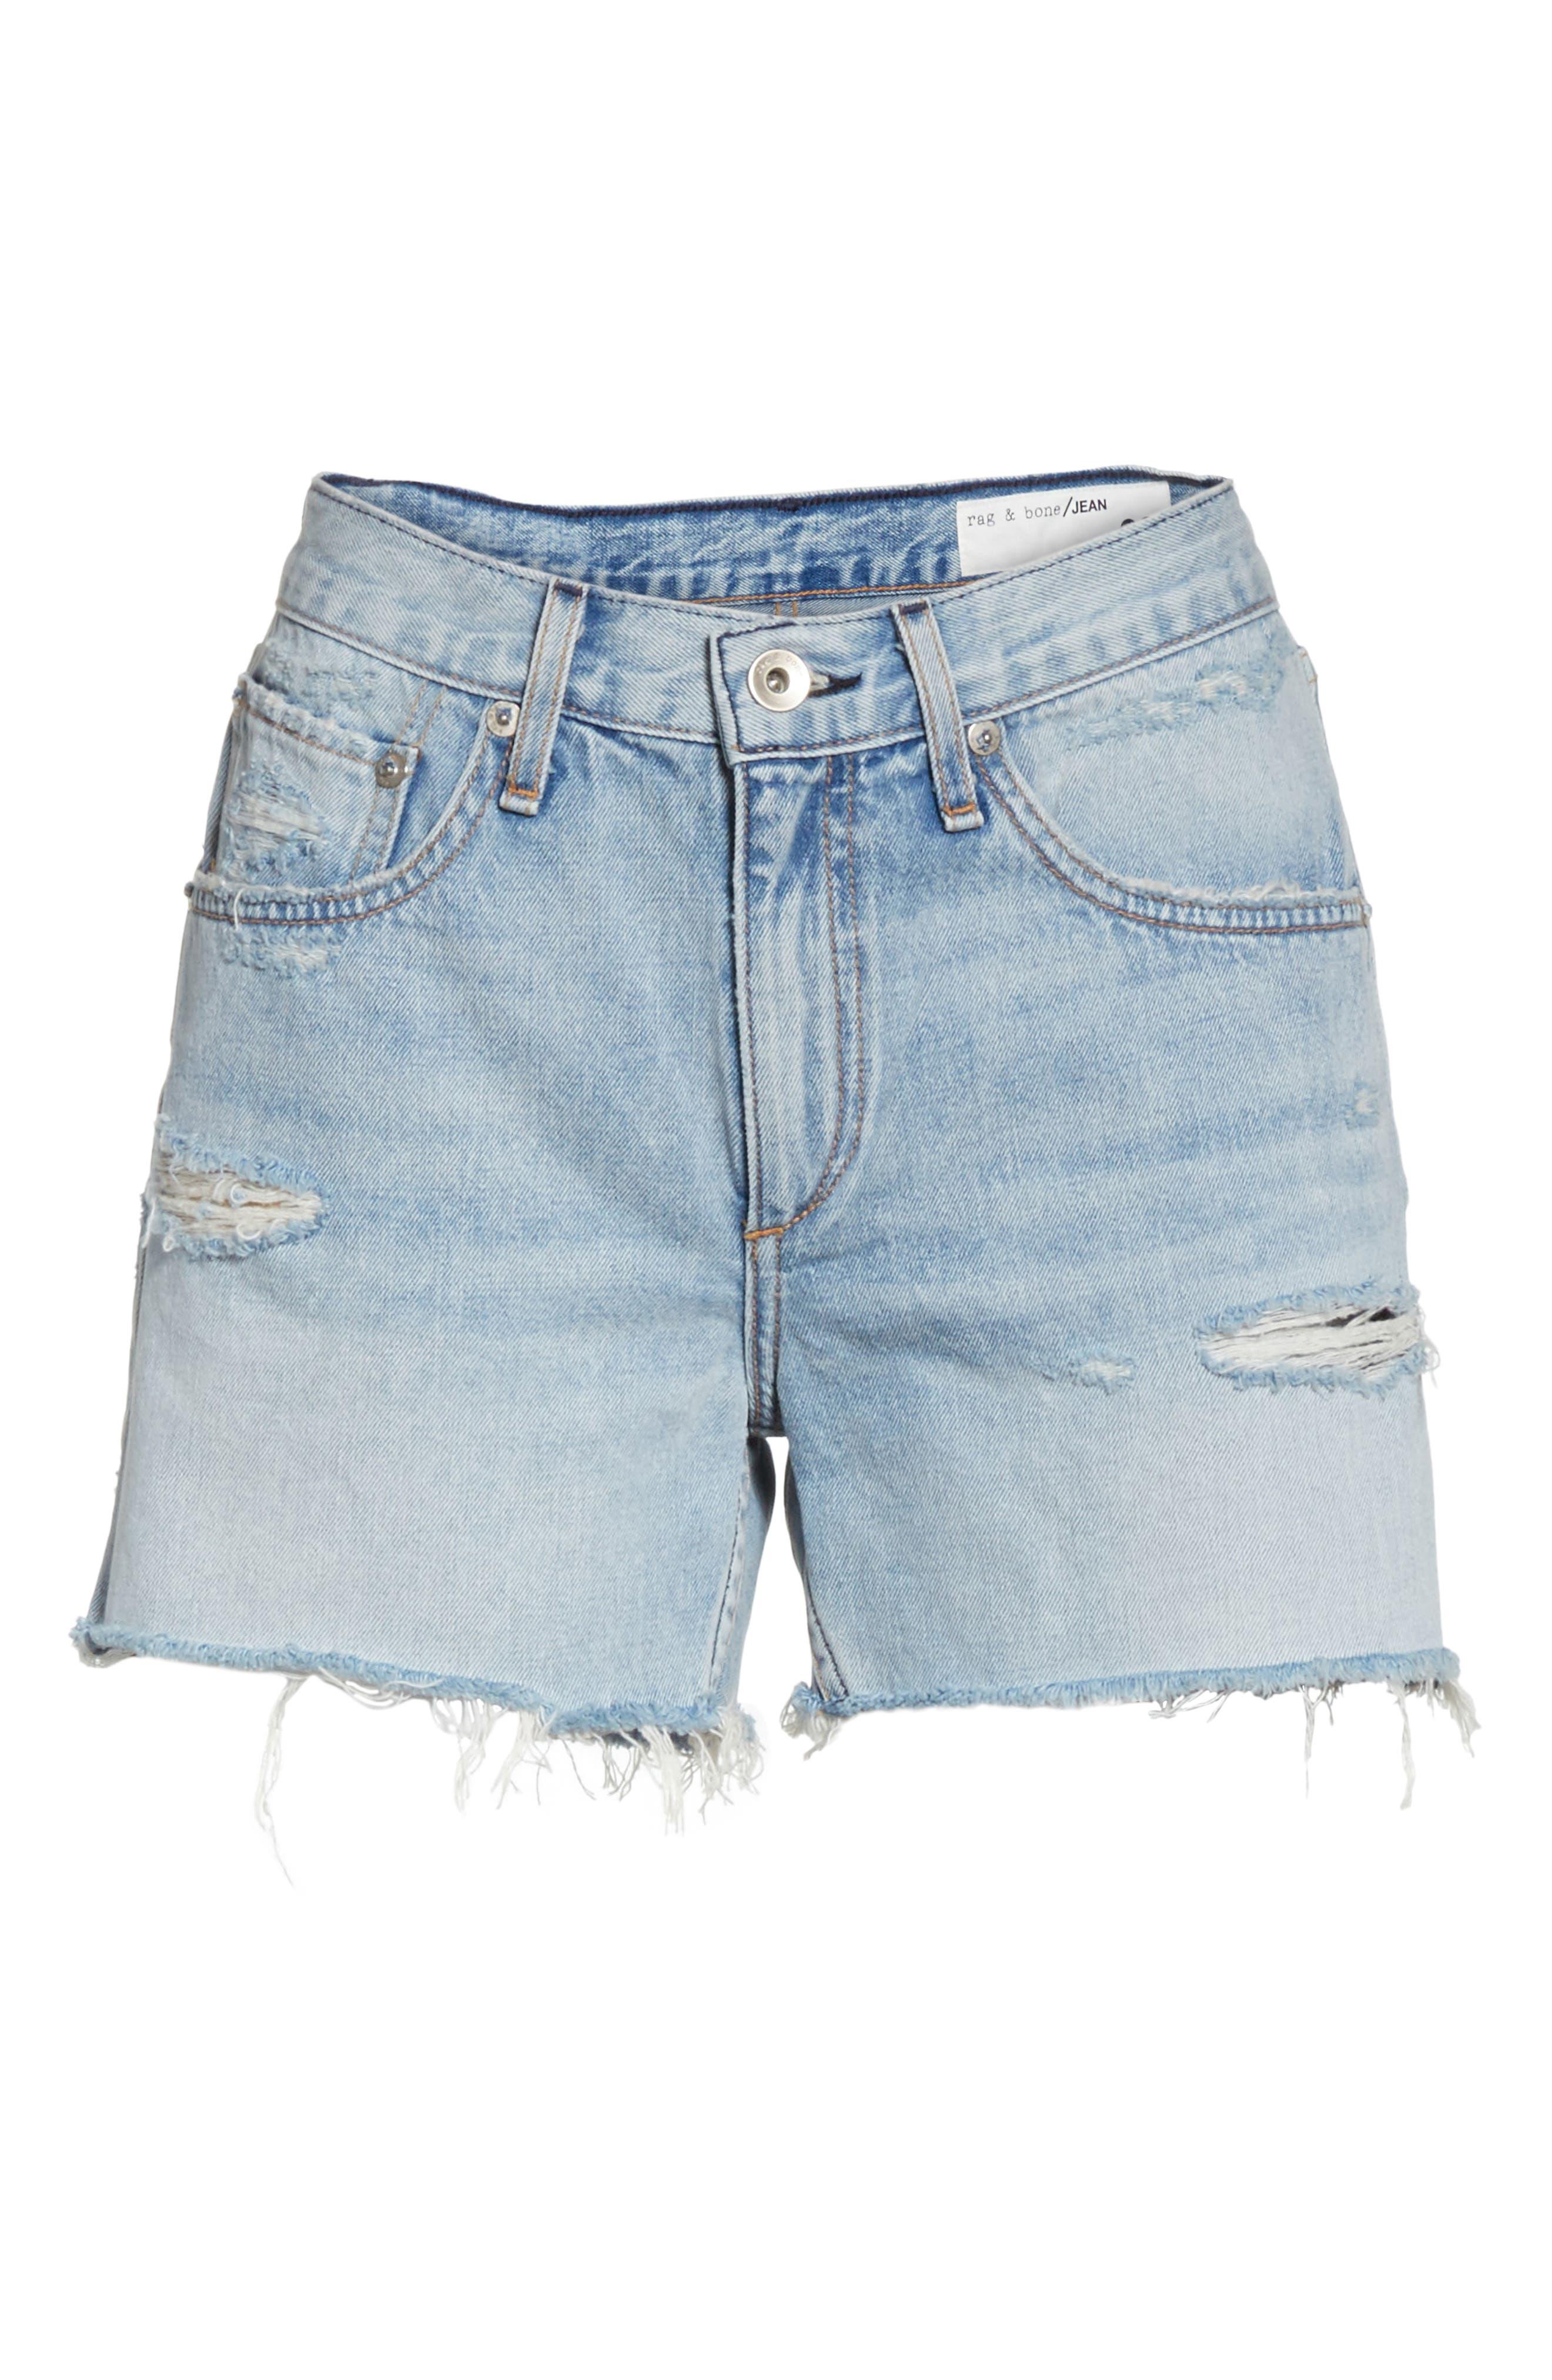 Boy Fray Denim Shorts,                             Alternate thumbnail 6, color,                             450